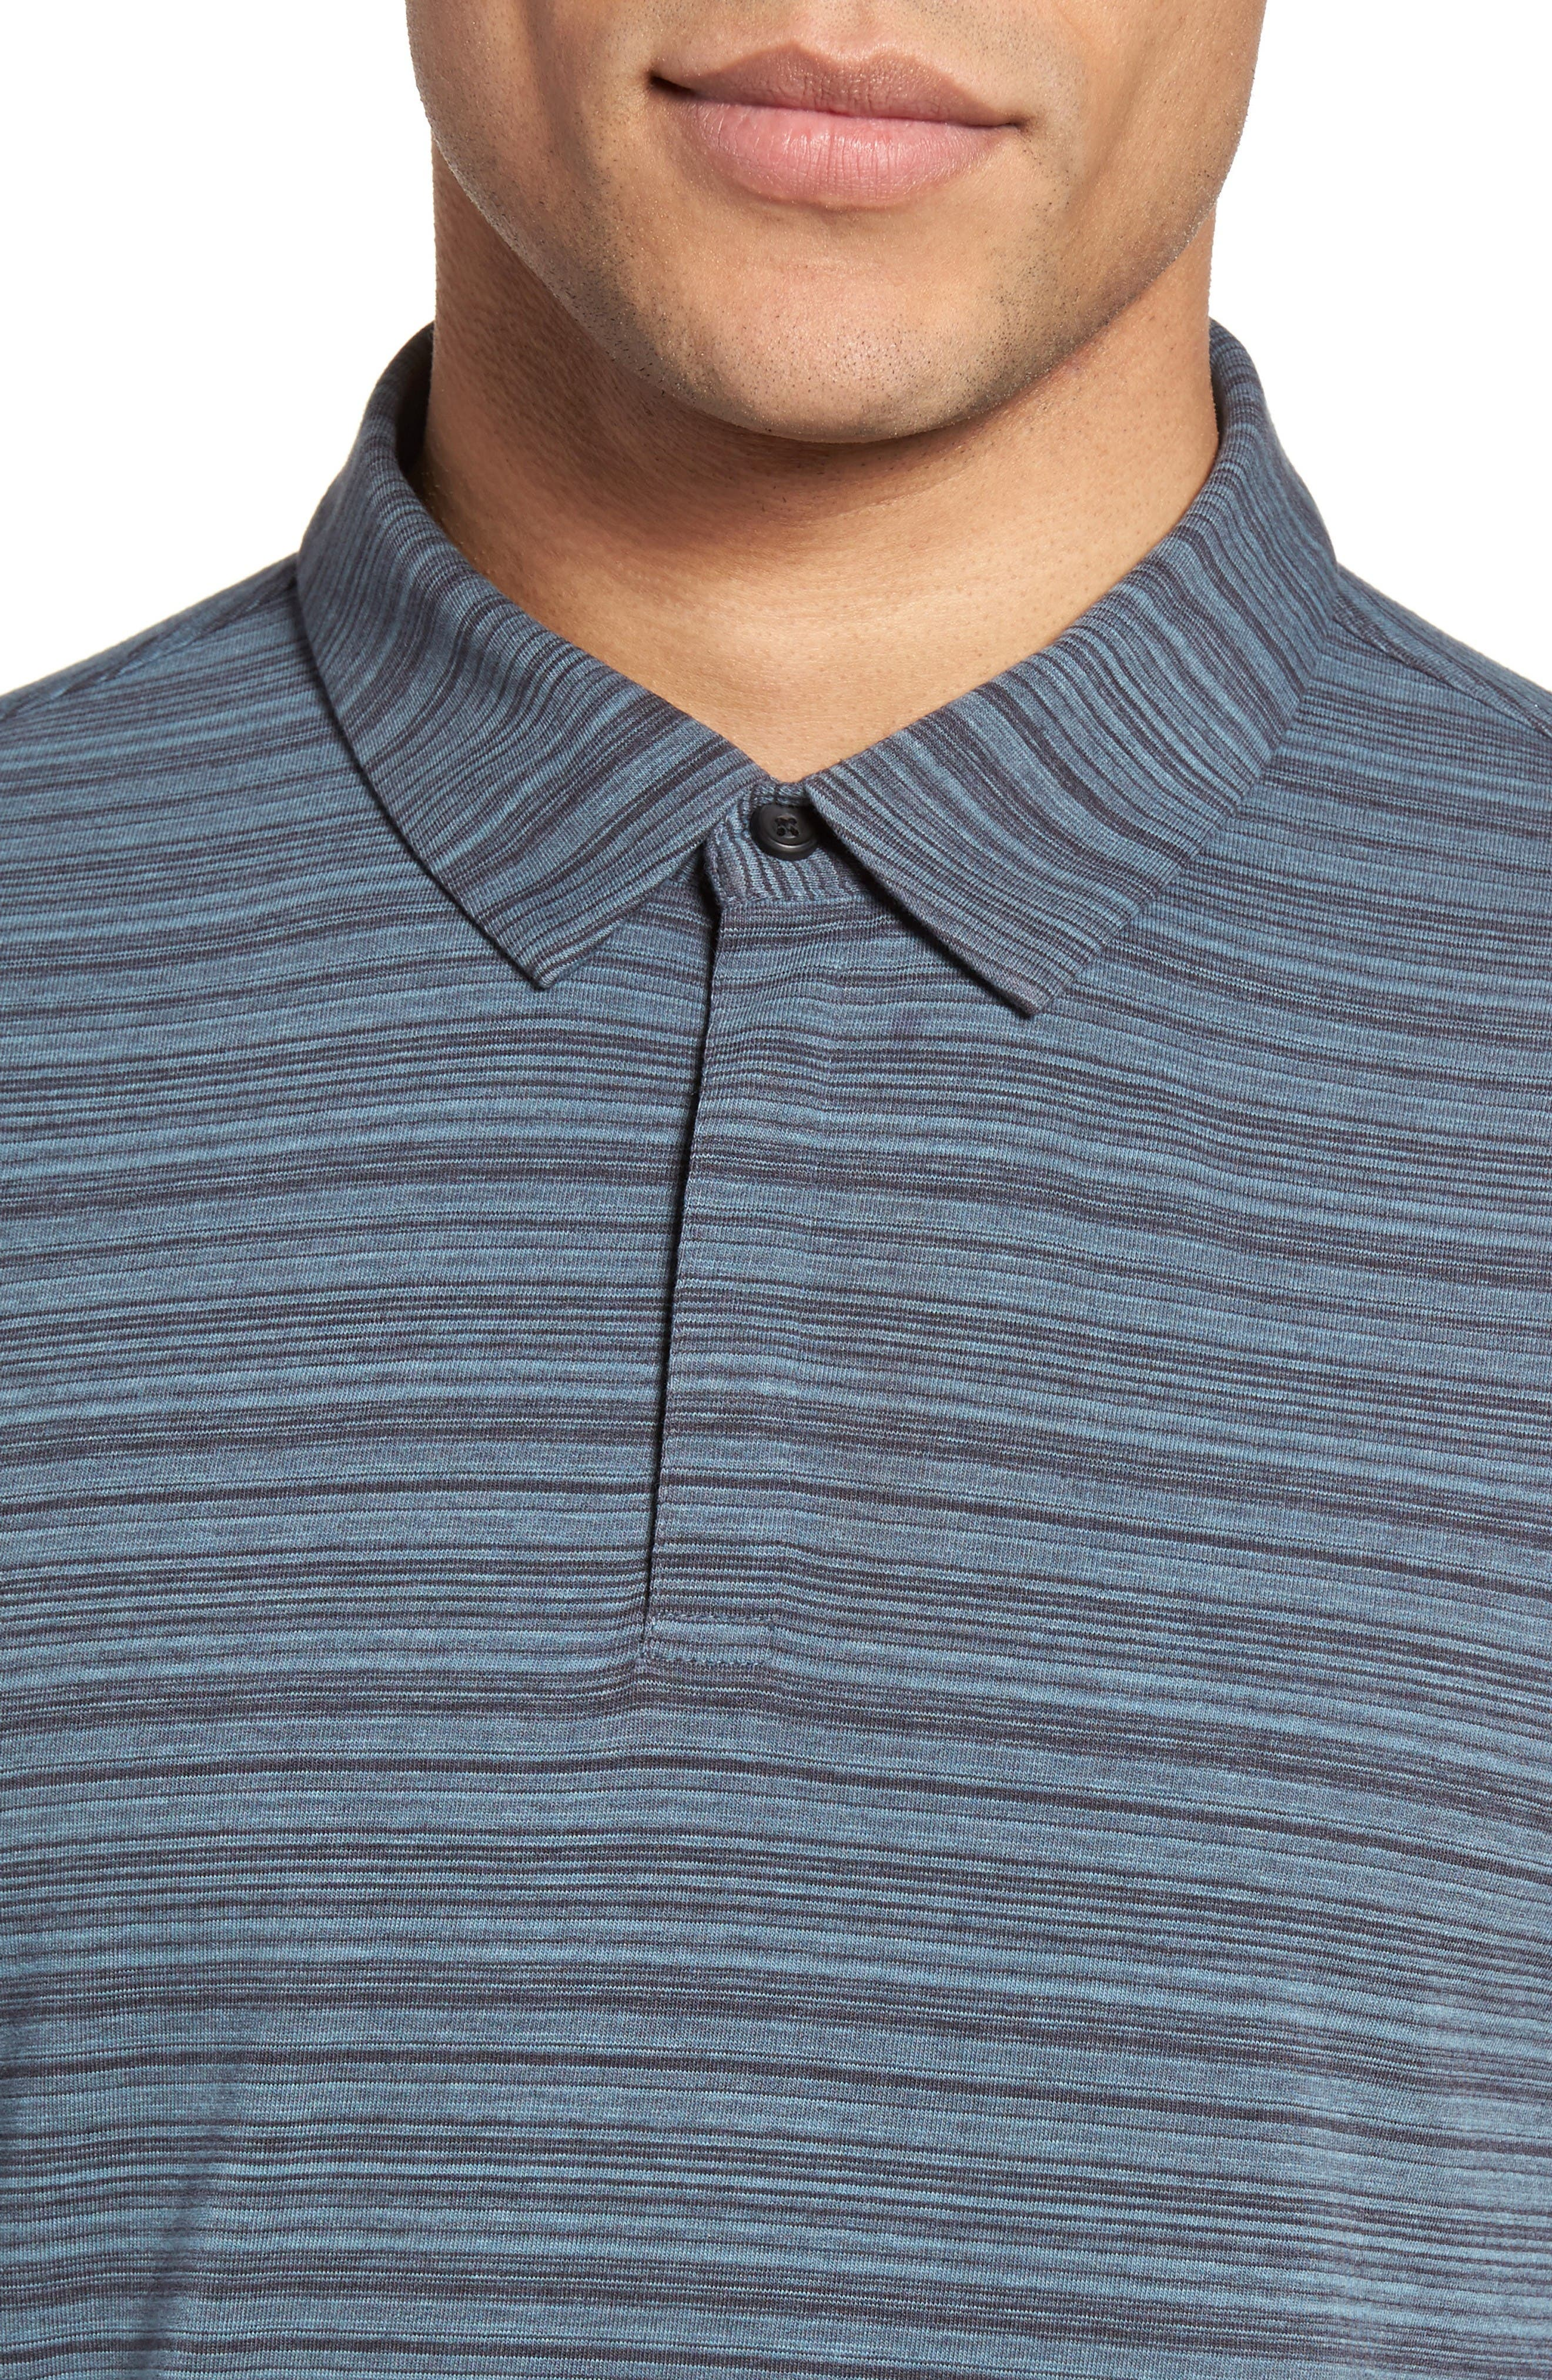 Trim Fit Stripe Polo,                             Alternate thumbnail 4, color,                             Blue Dusk Varied Stripe